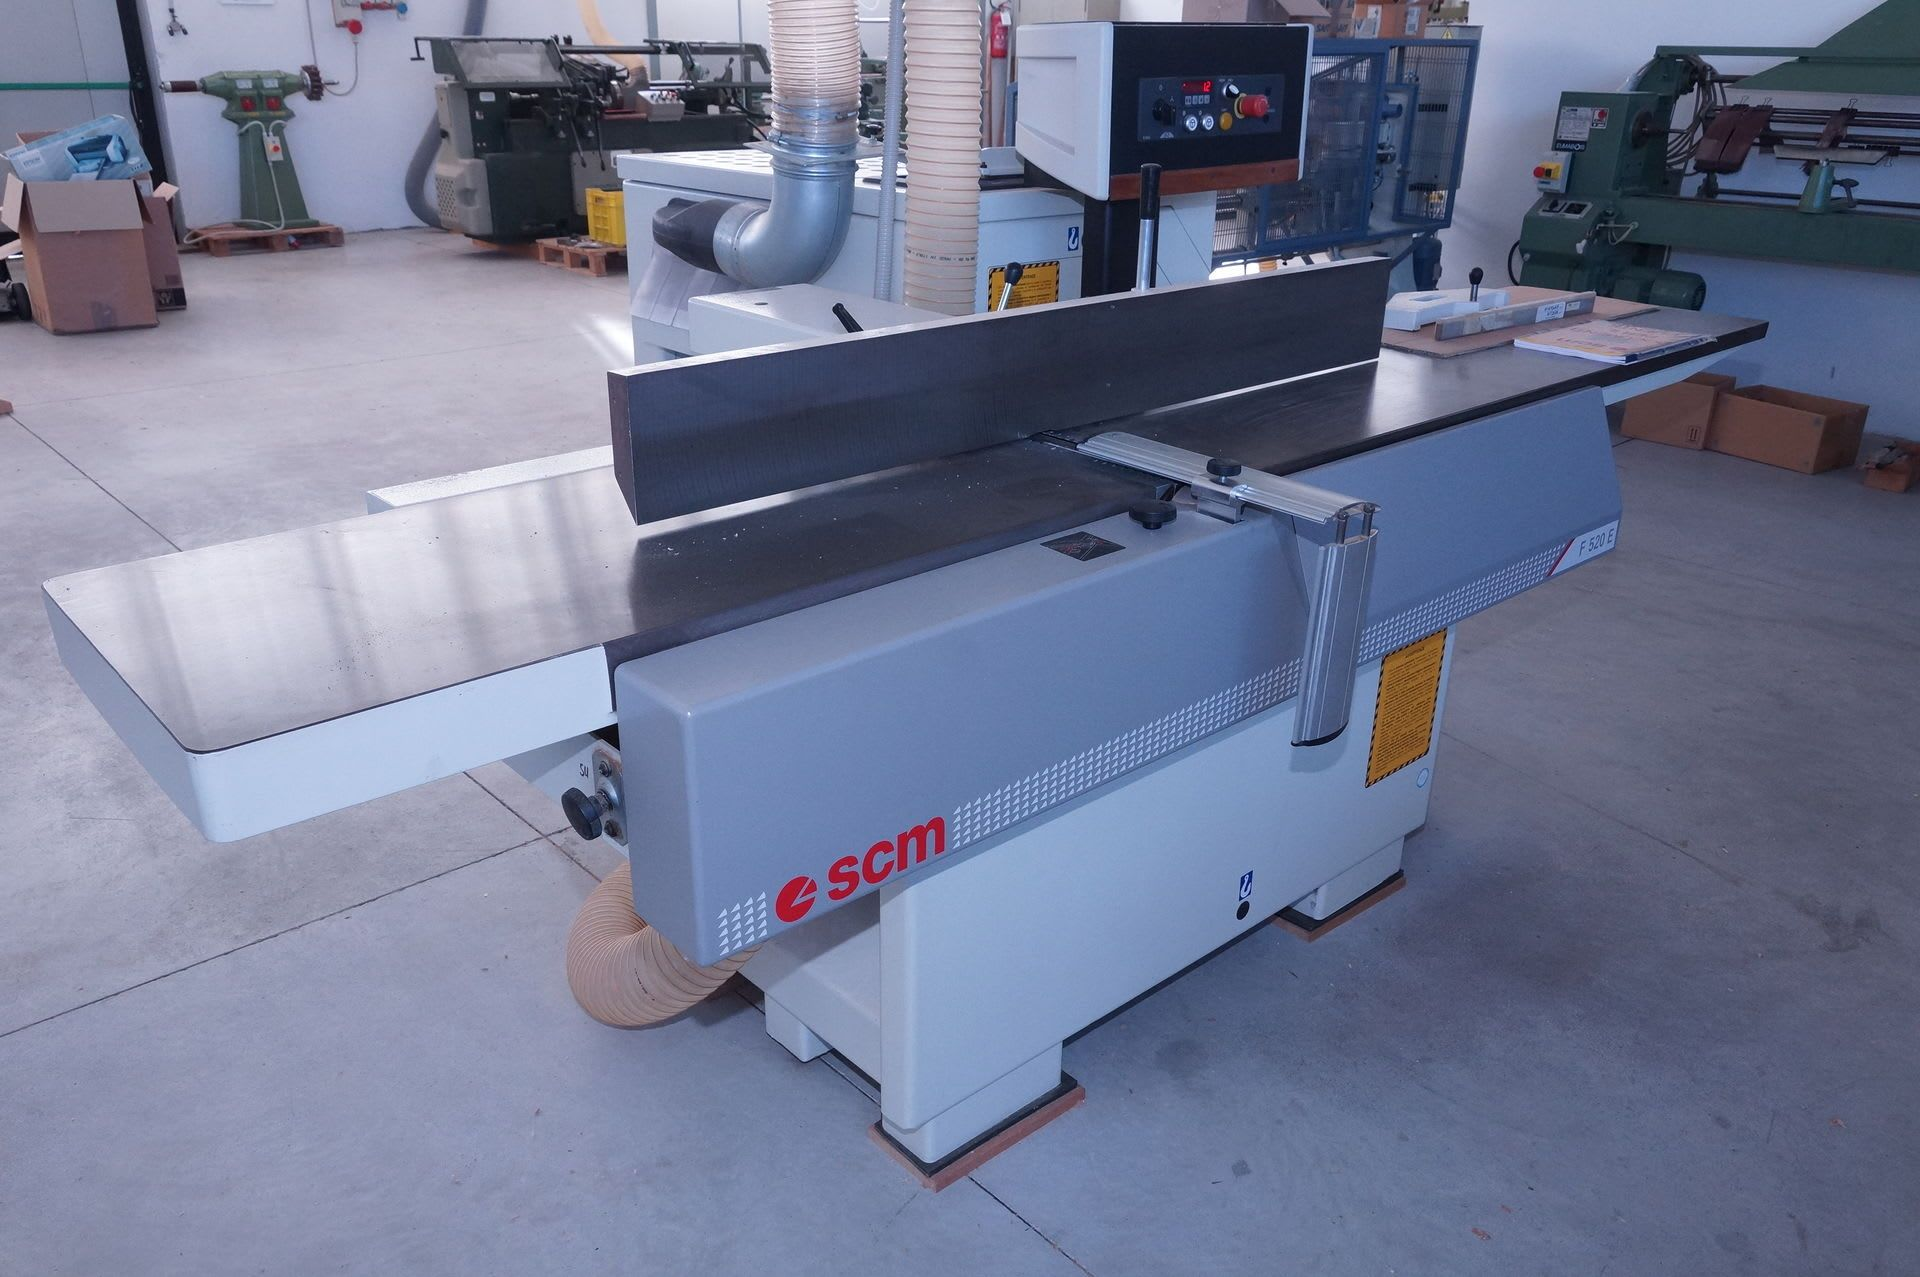 SCM F520E Abrichthobelmaschine